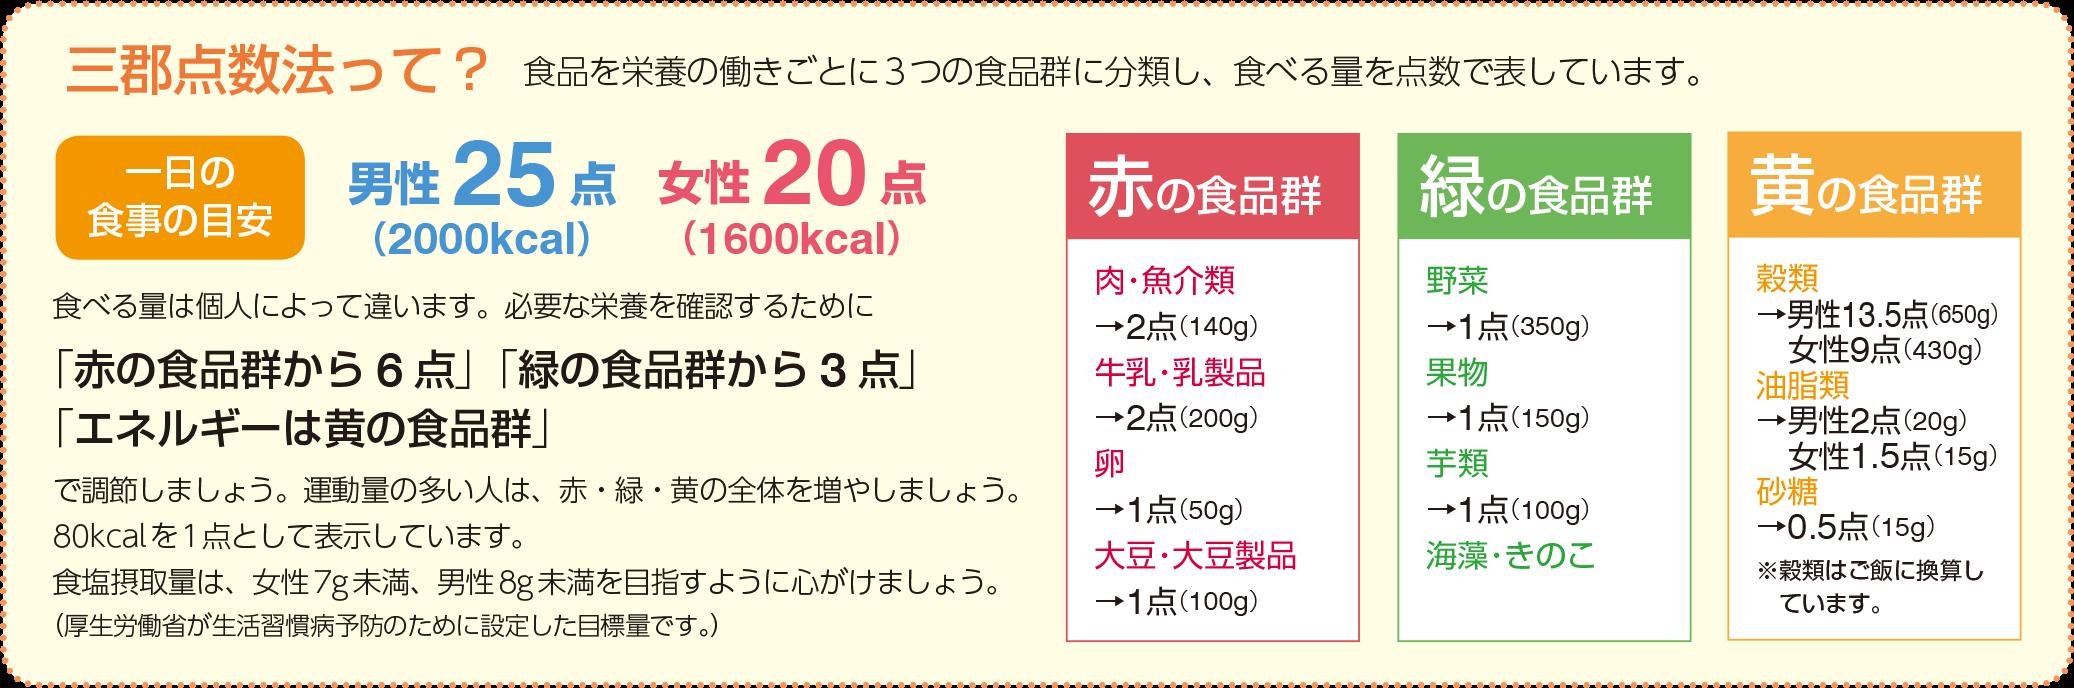 http://kpu-m.u-coop.net/service/2018/02/food_01.png